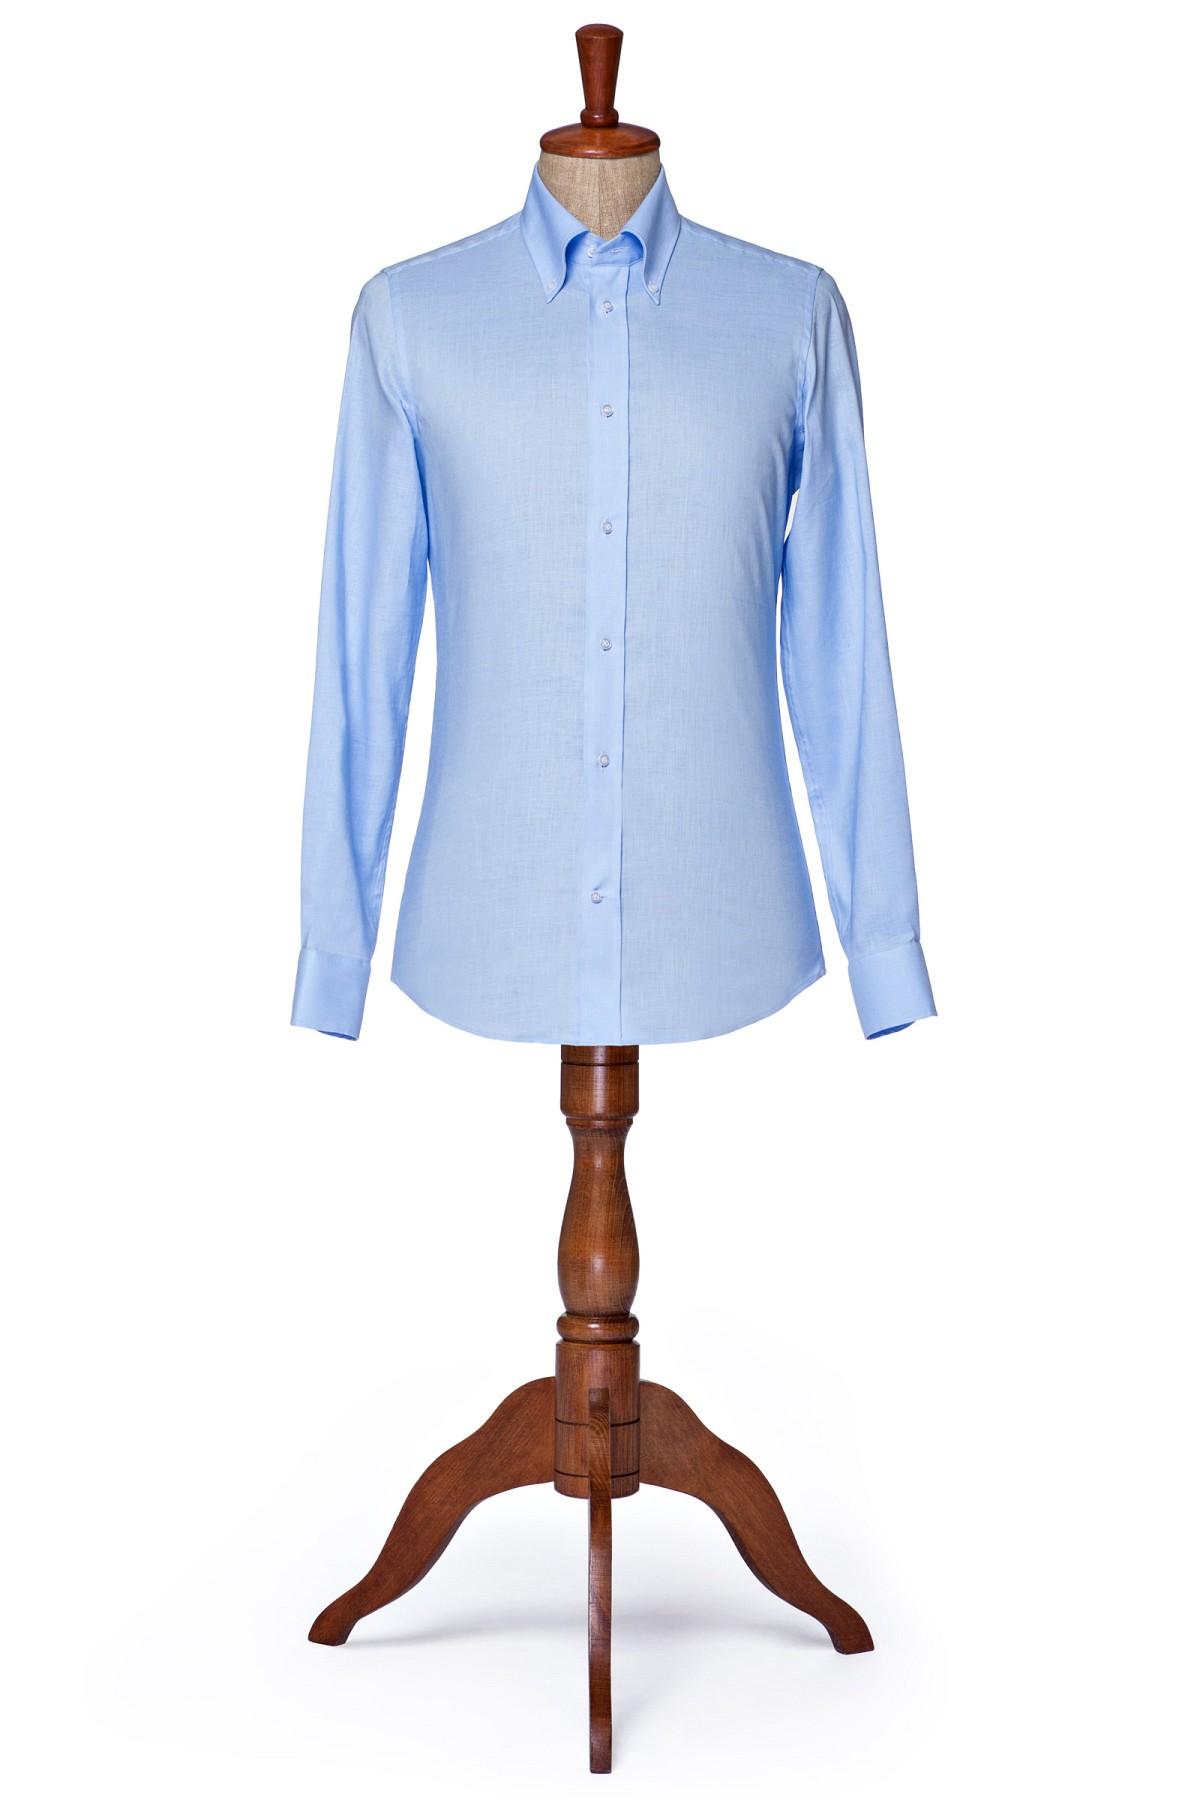 Koszula Niebieska Crossroad Lancerto KO092118000010.NIEBIESK